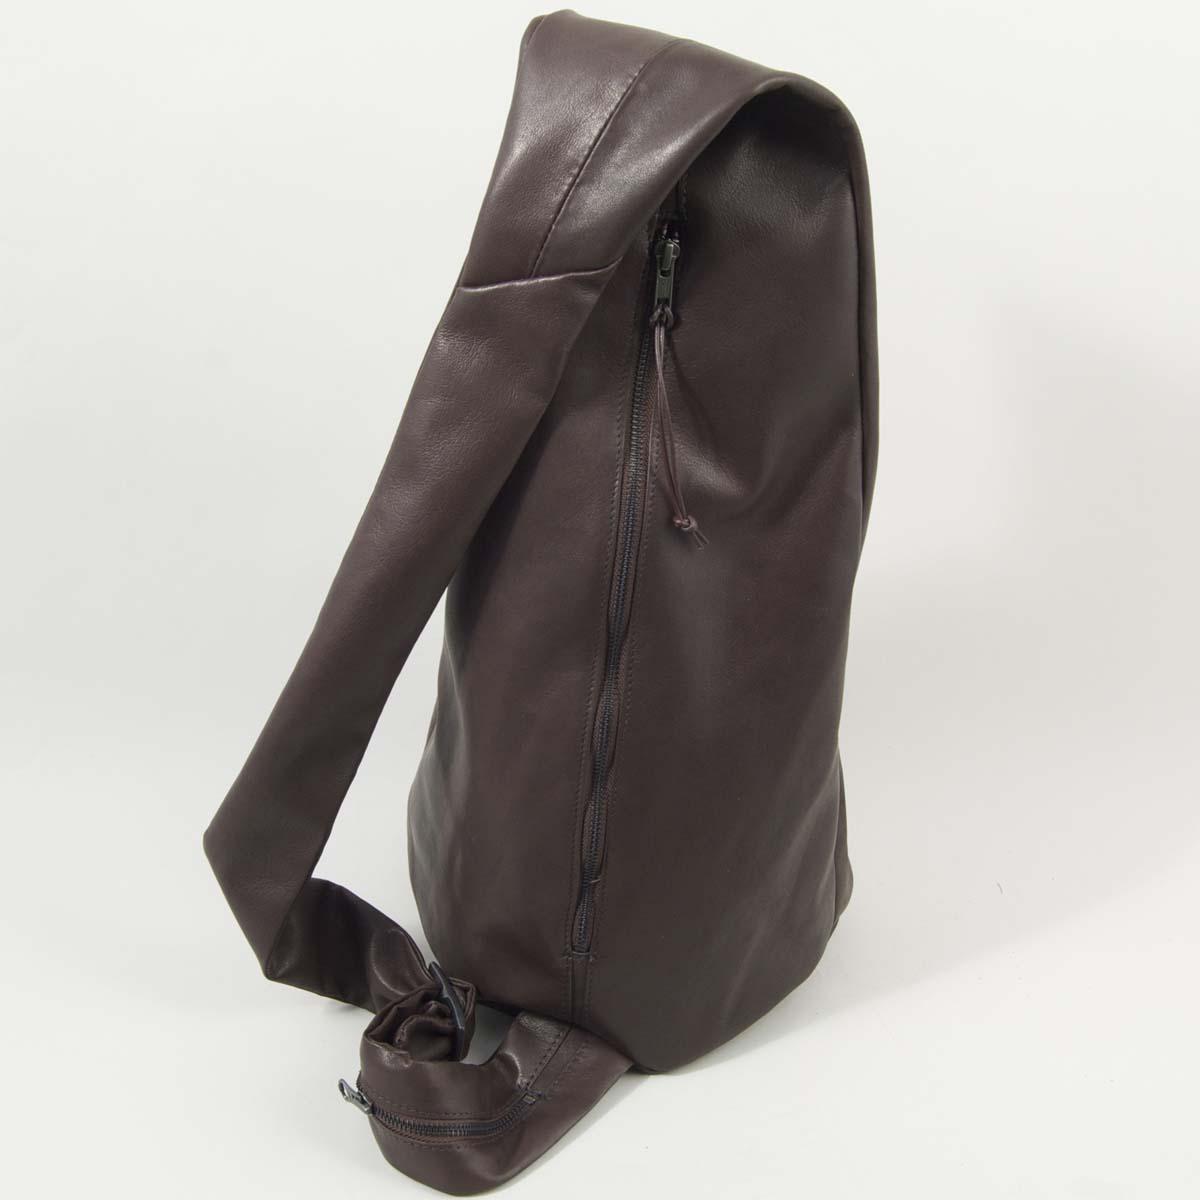 The Drop Bag